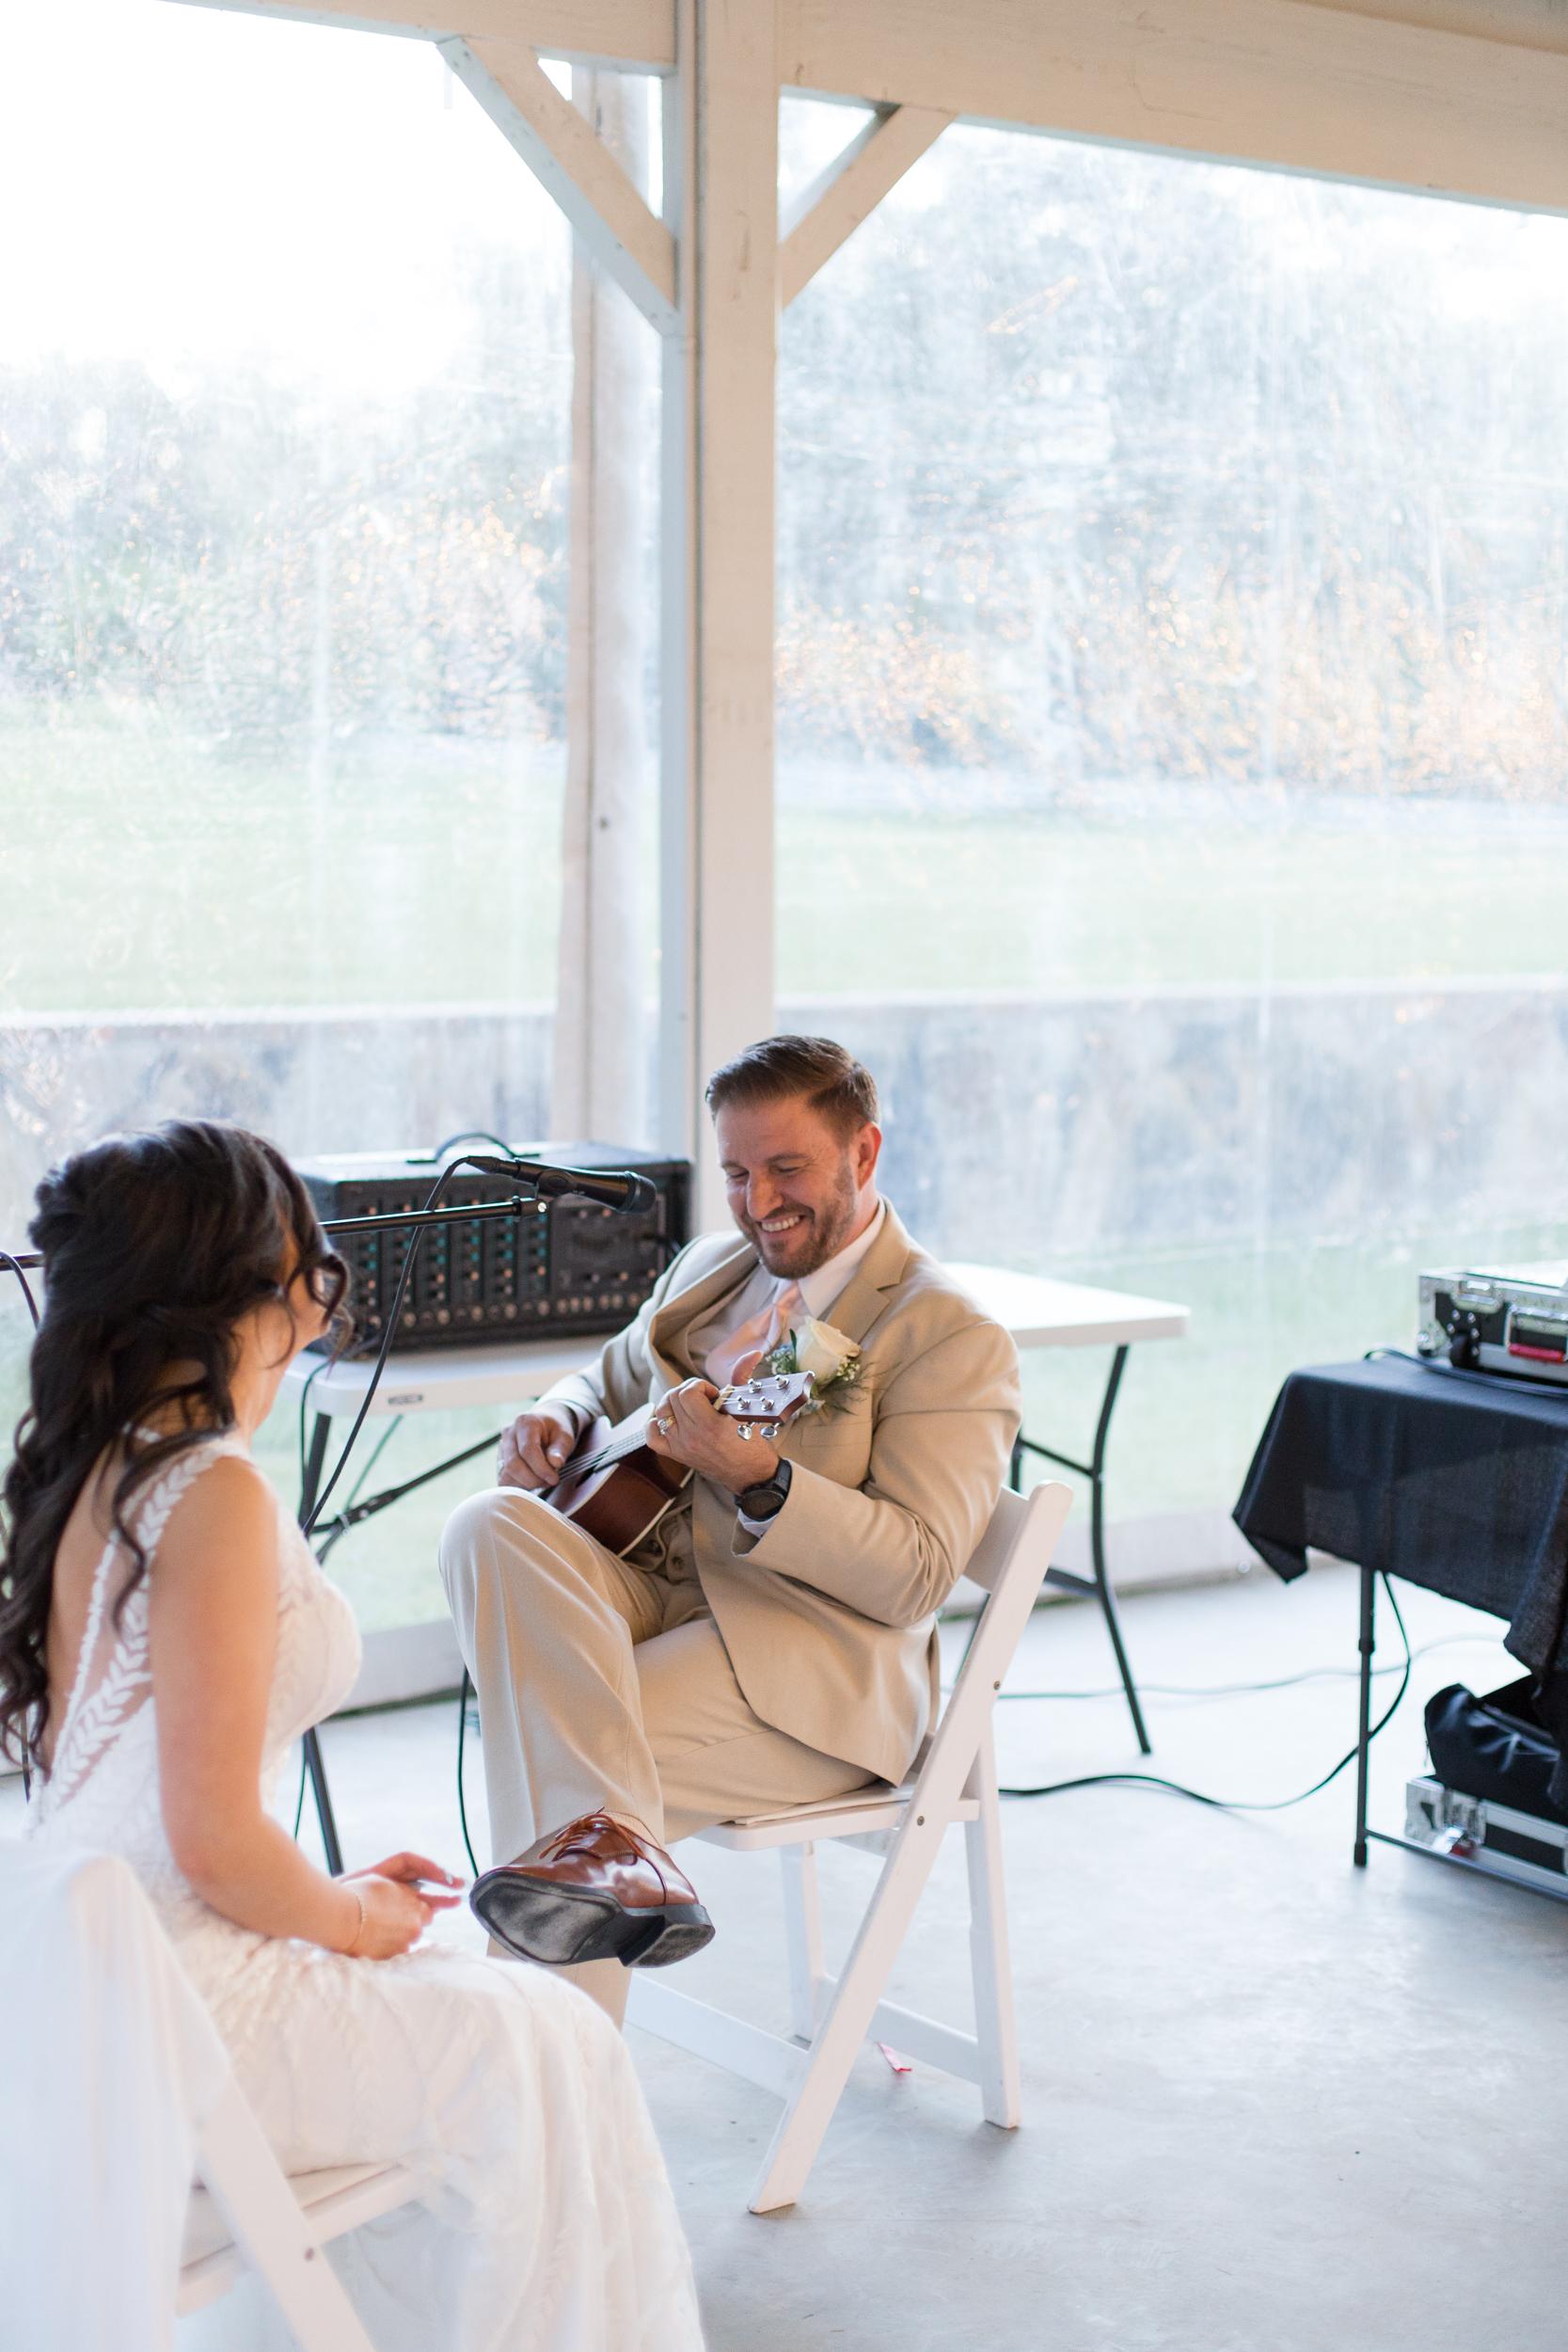 Zihlman-East TX Wedding_Kelsie Hendricks Photography_The Folmar Tyler Texas-132.jpg